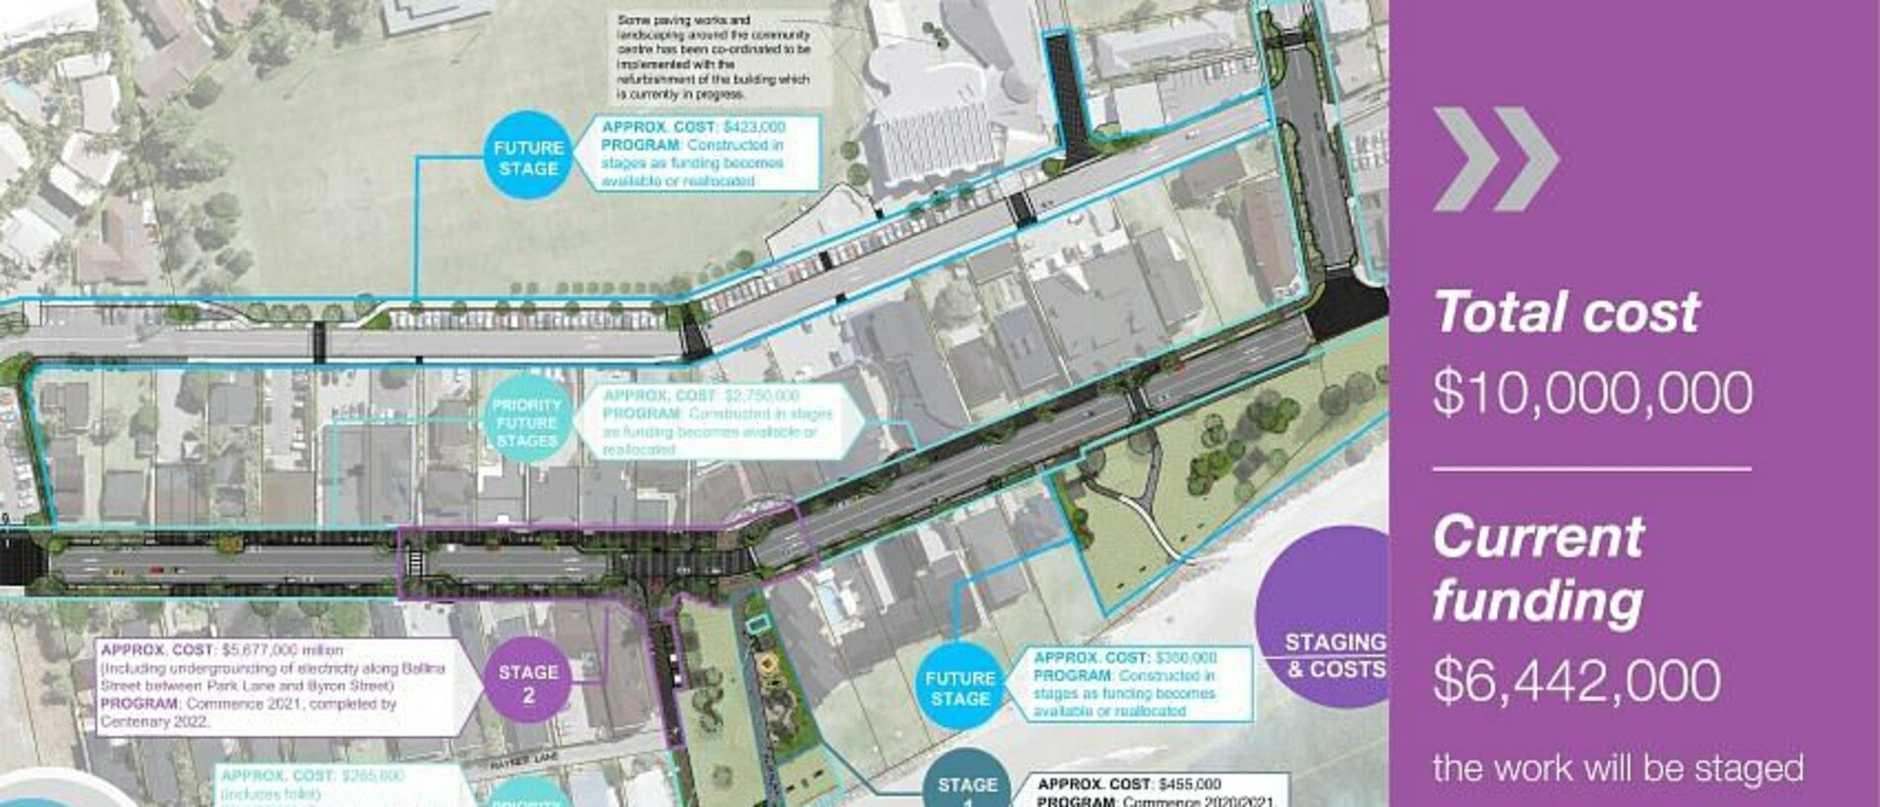 Lennox Village Vision draft concept plan.